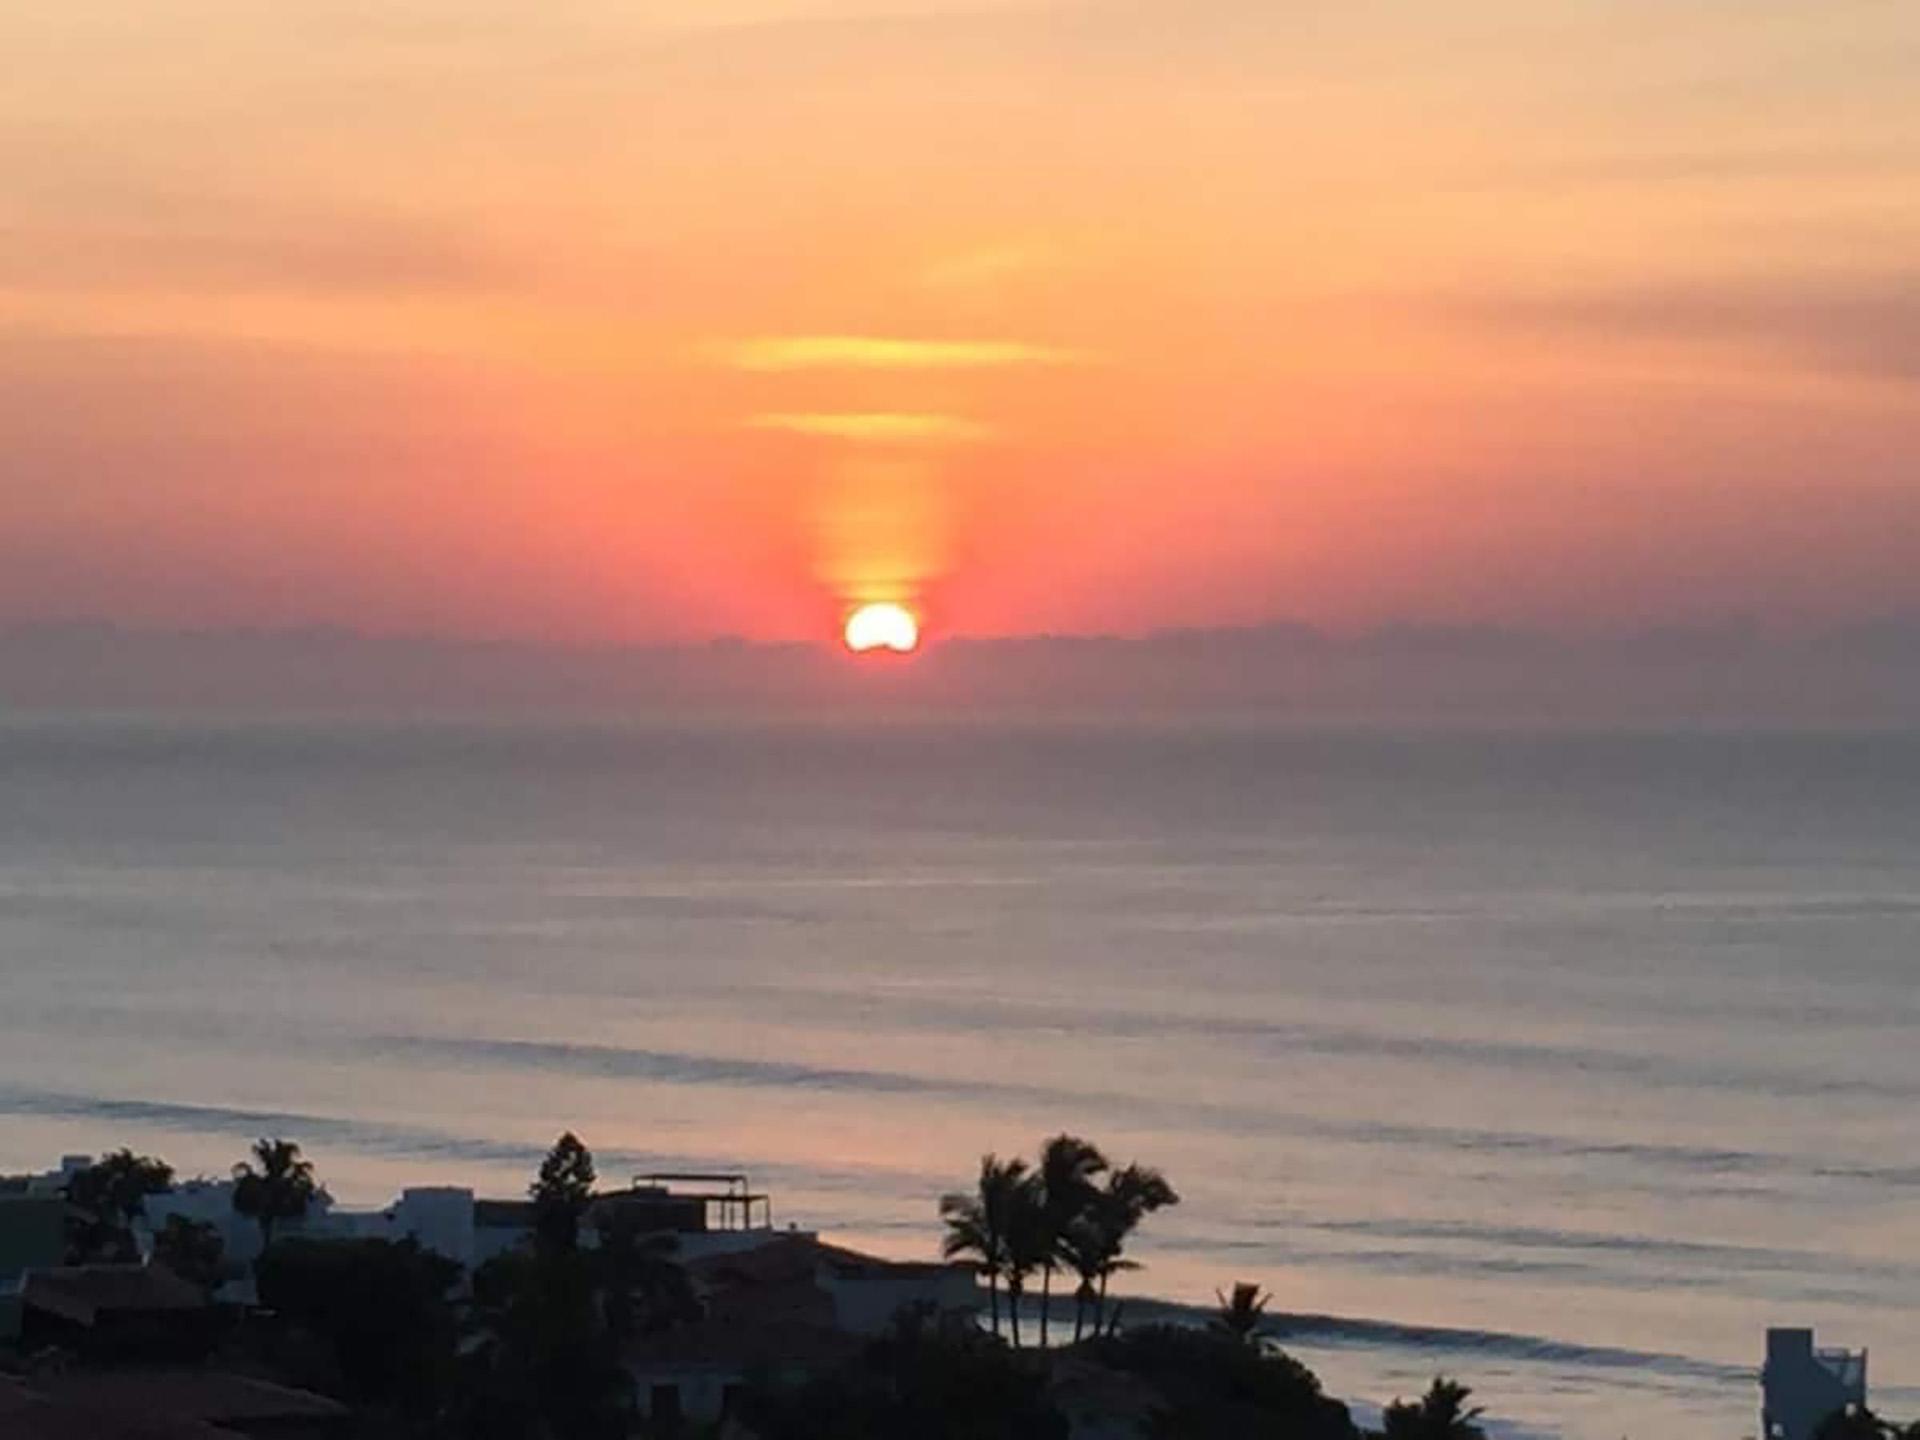 enjoy the beautiful view of the horizon